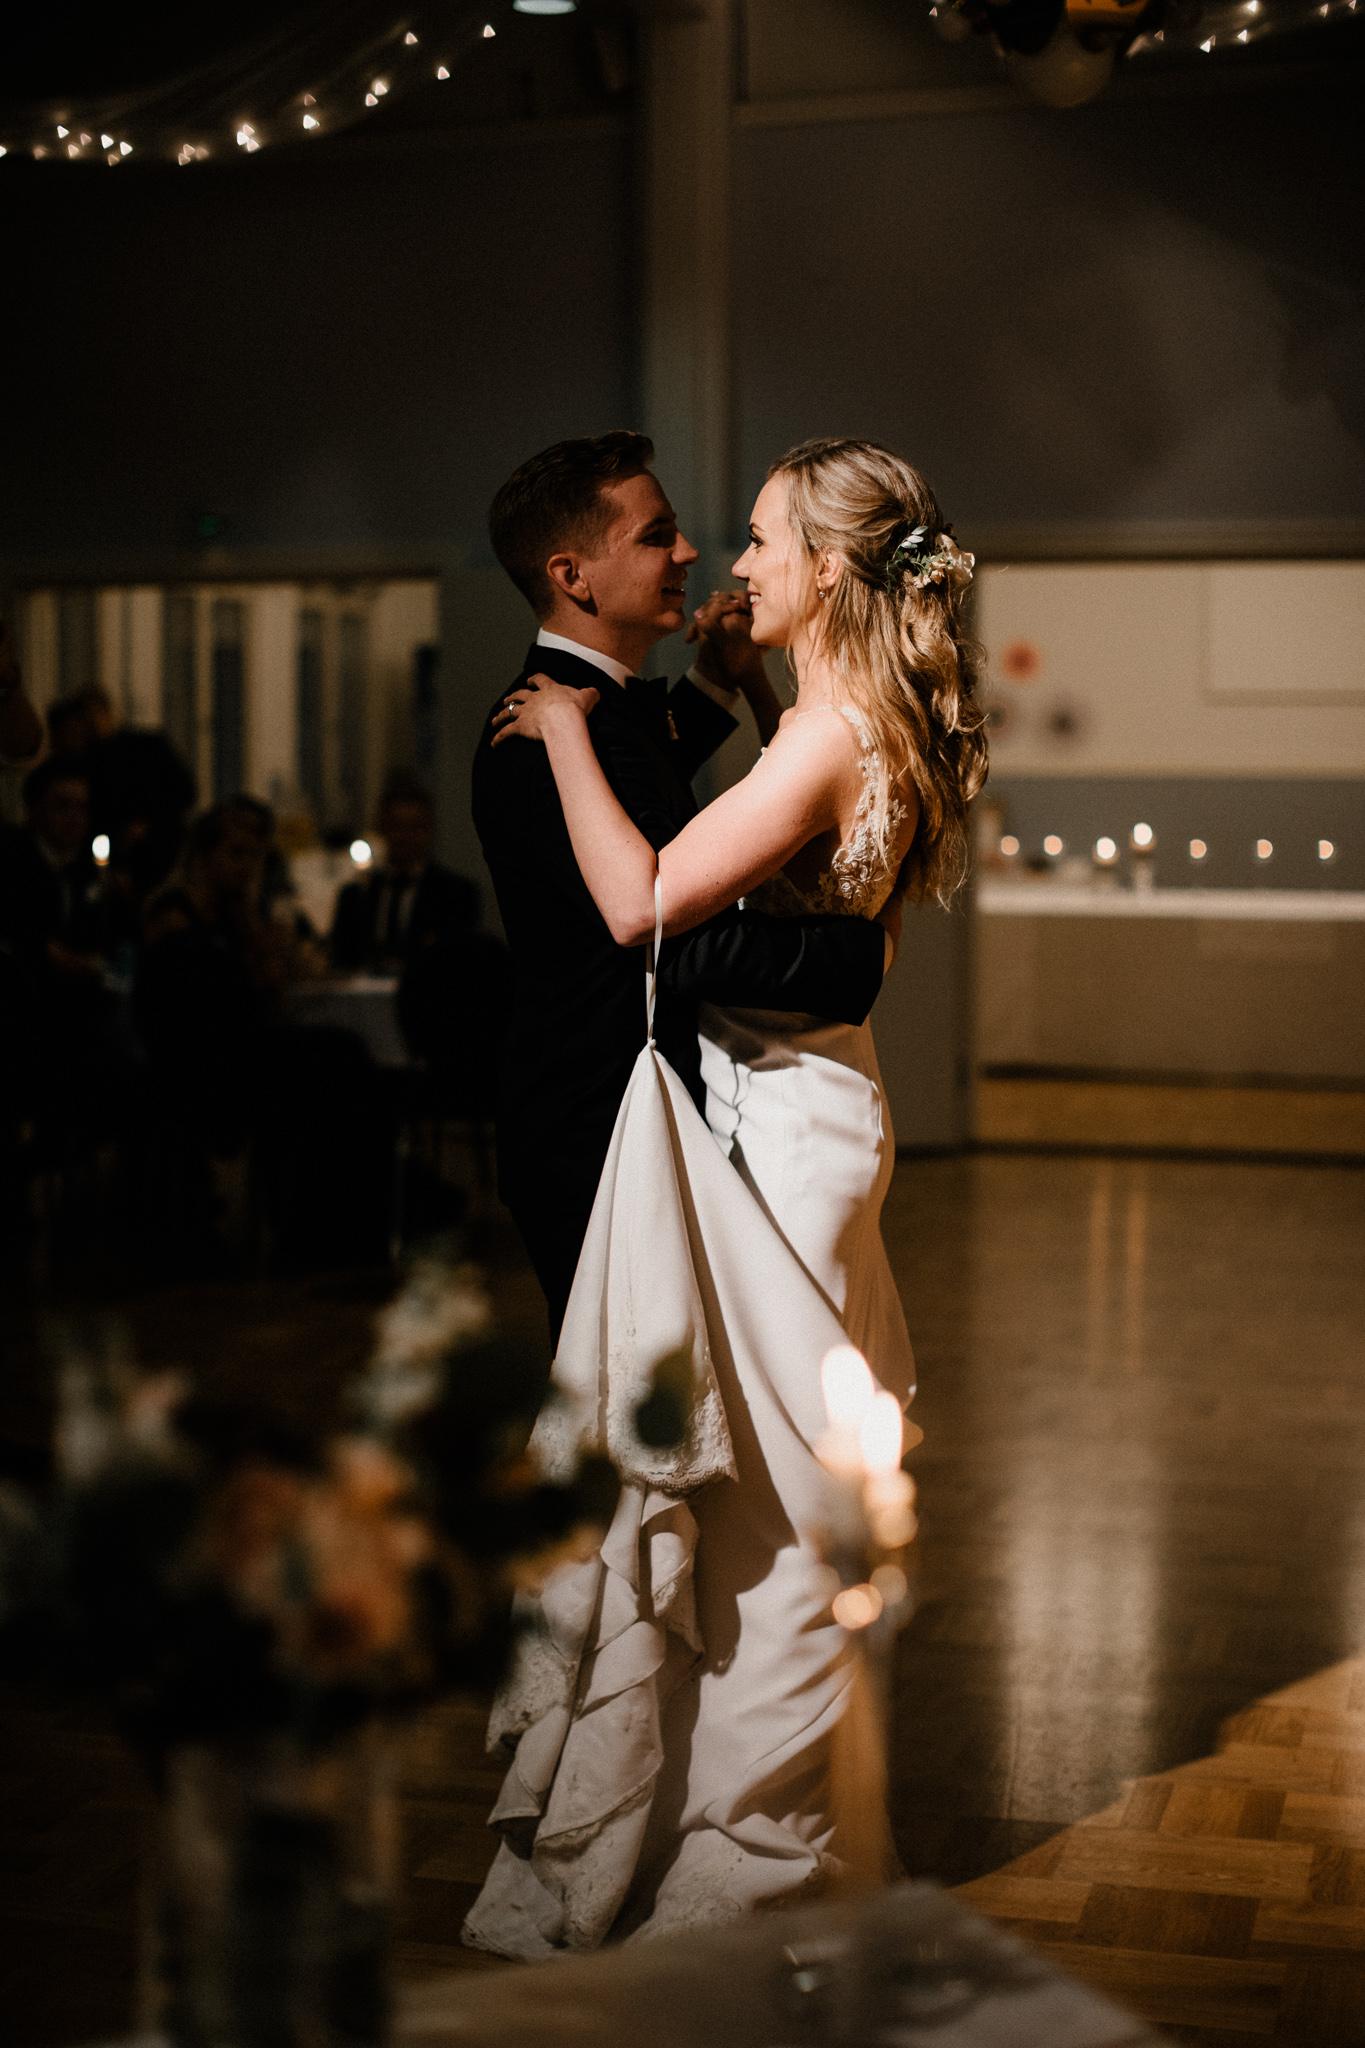 Johanna + Mikko - Tampere - Photo by Patrick Karkkolainen Wedding Photographer-189.jpg